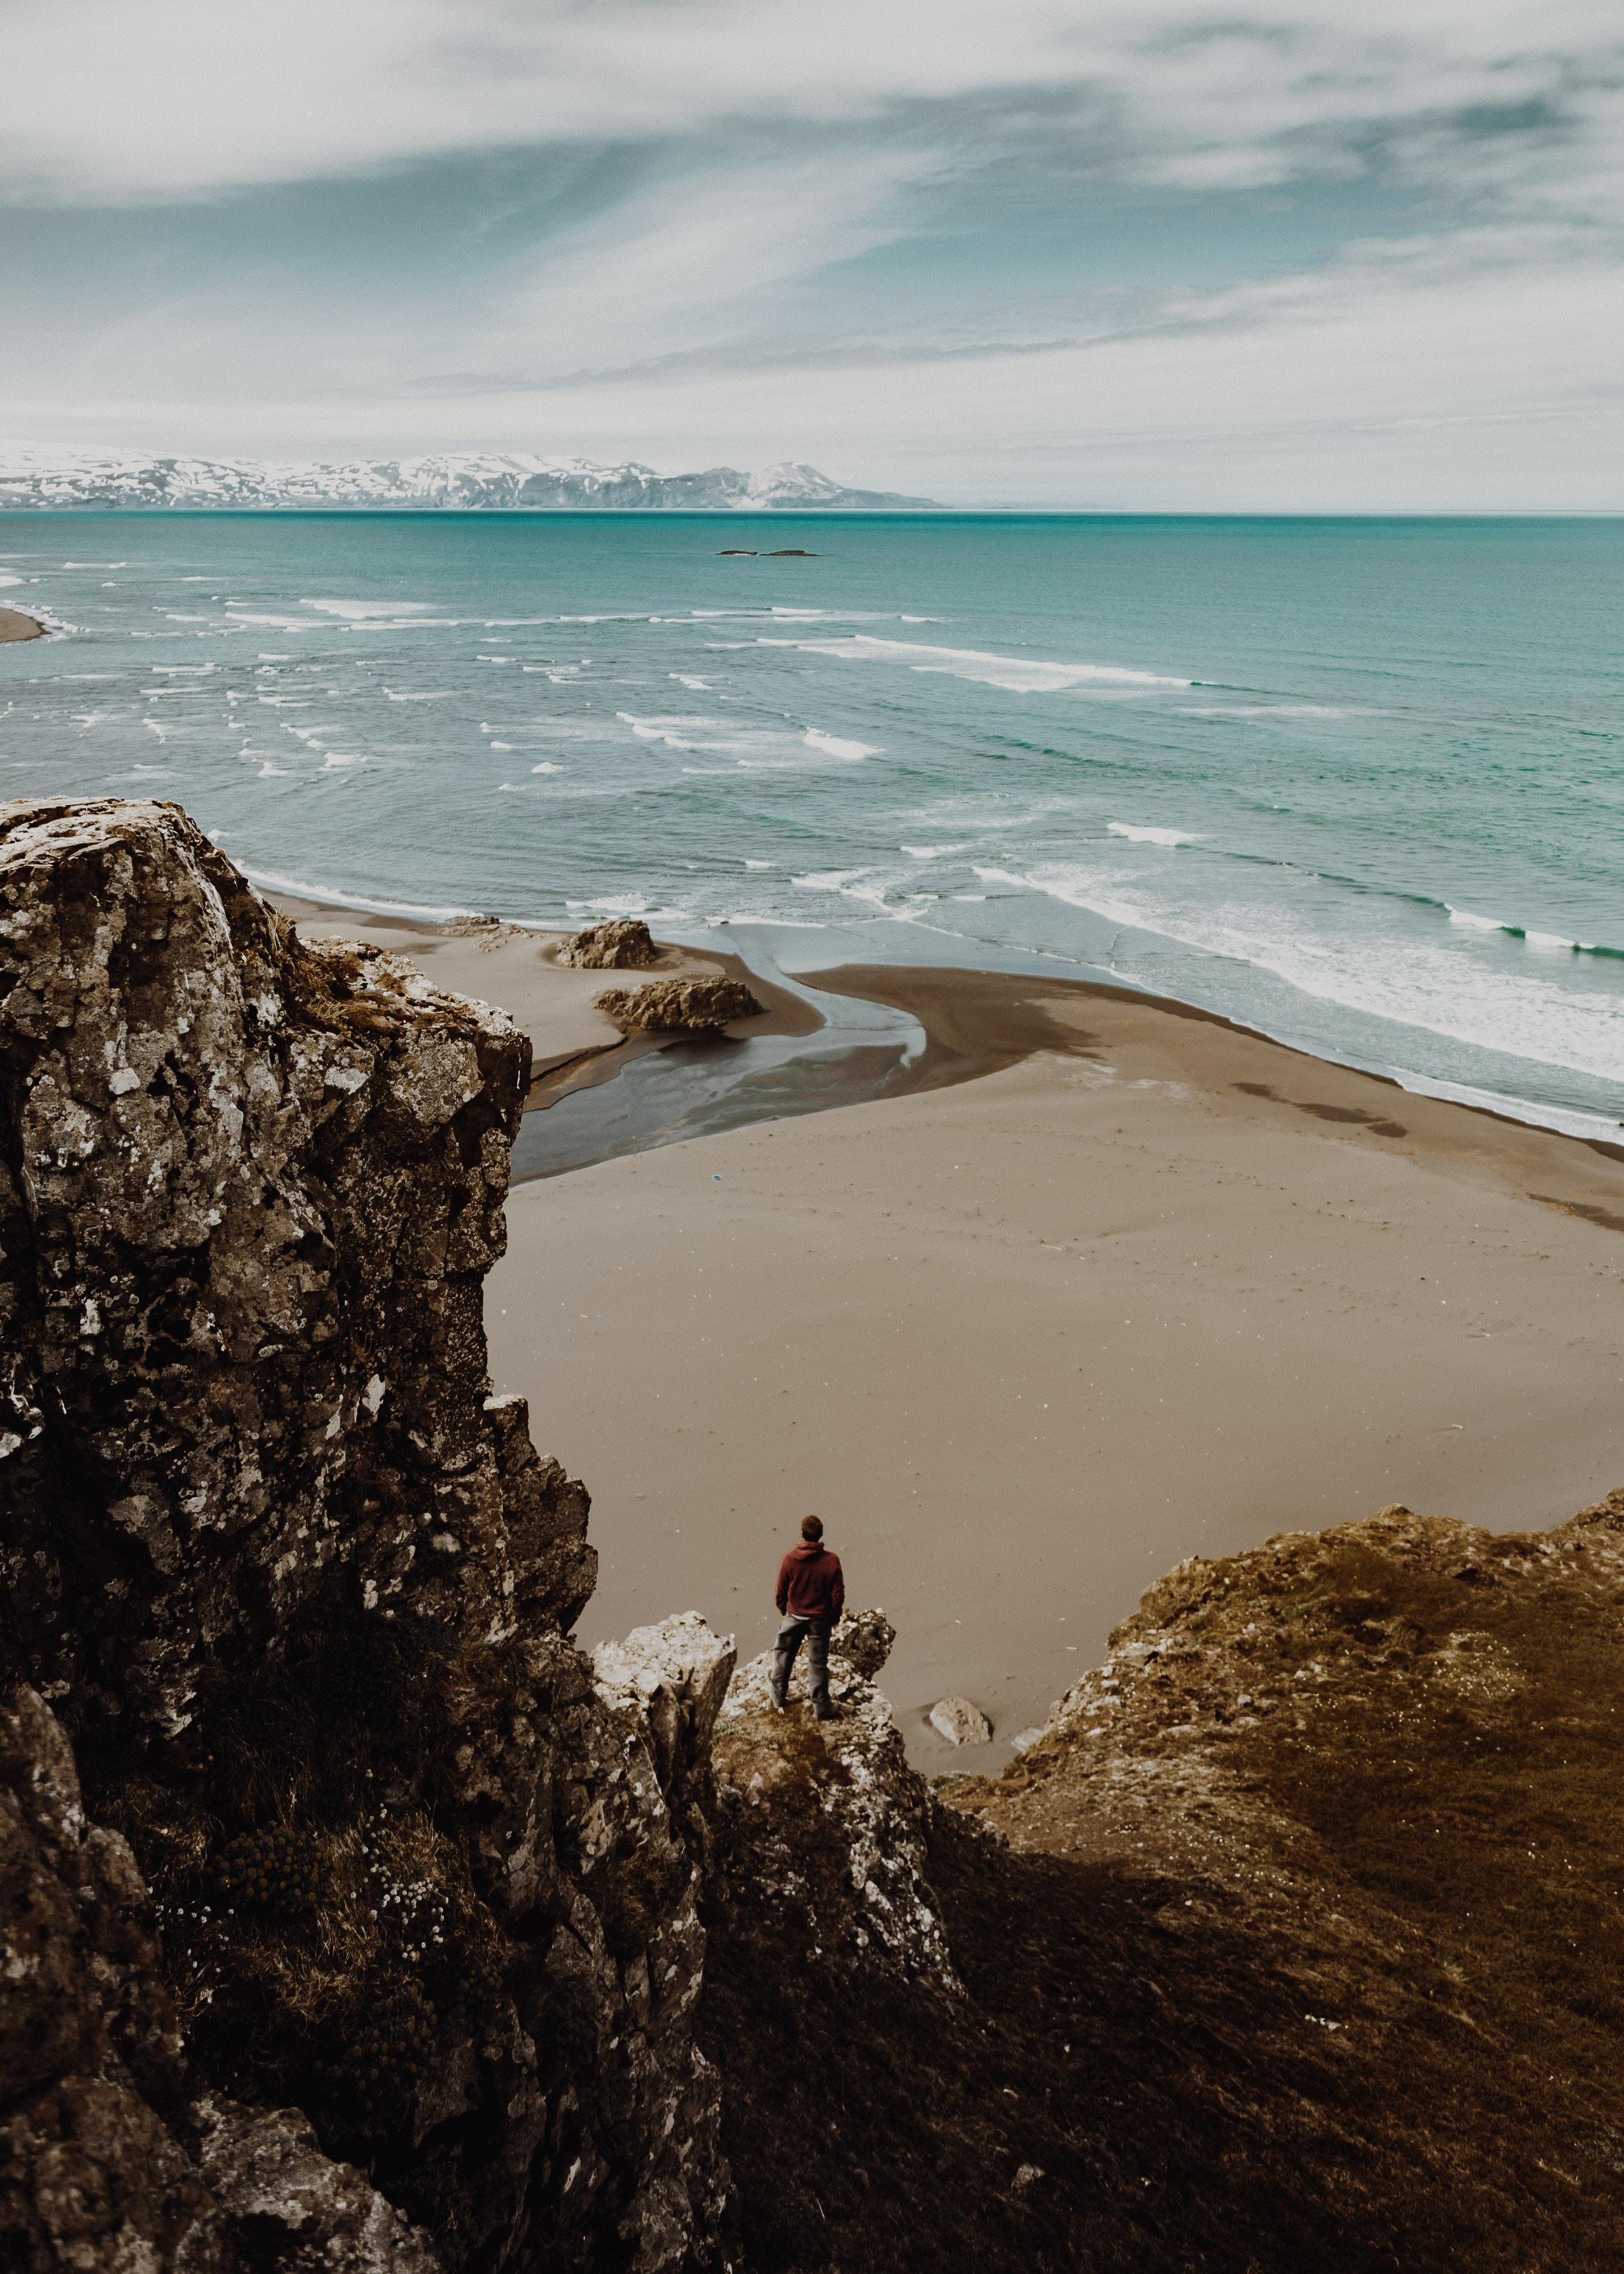 32-iceland-eastfjords-hiking-mountains-anna-elina-lahti-photographer.jpg